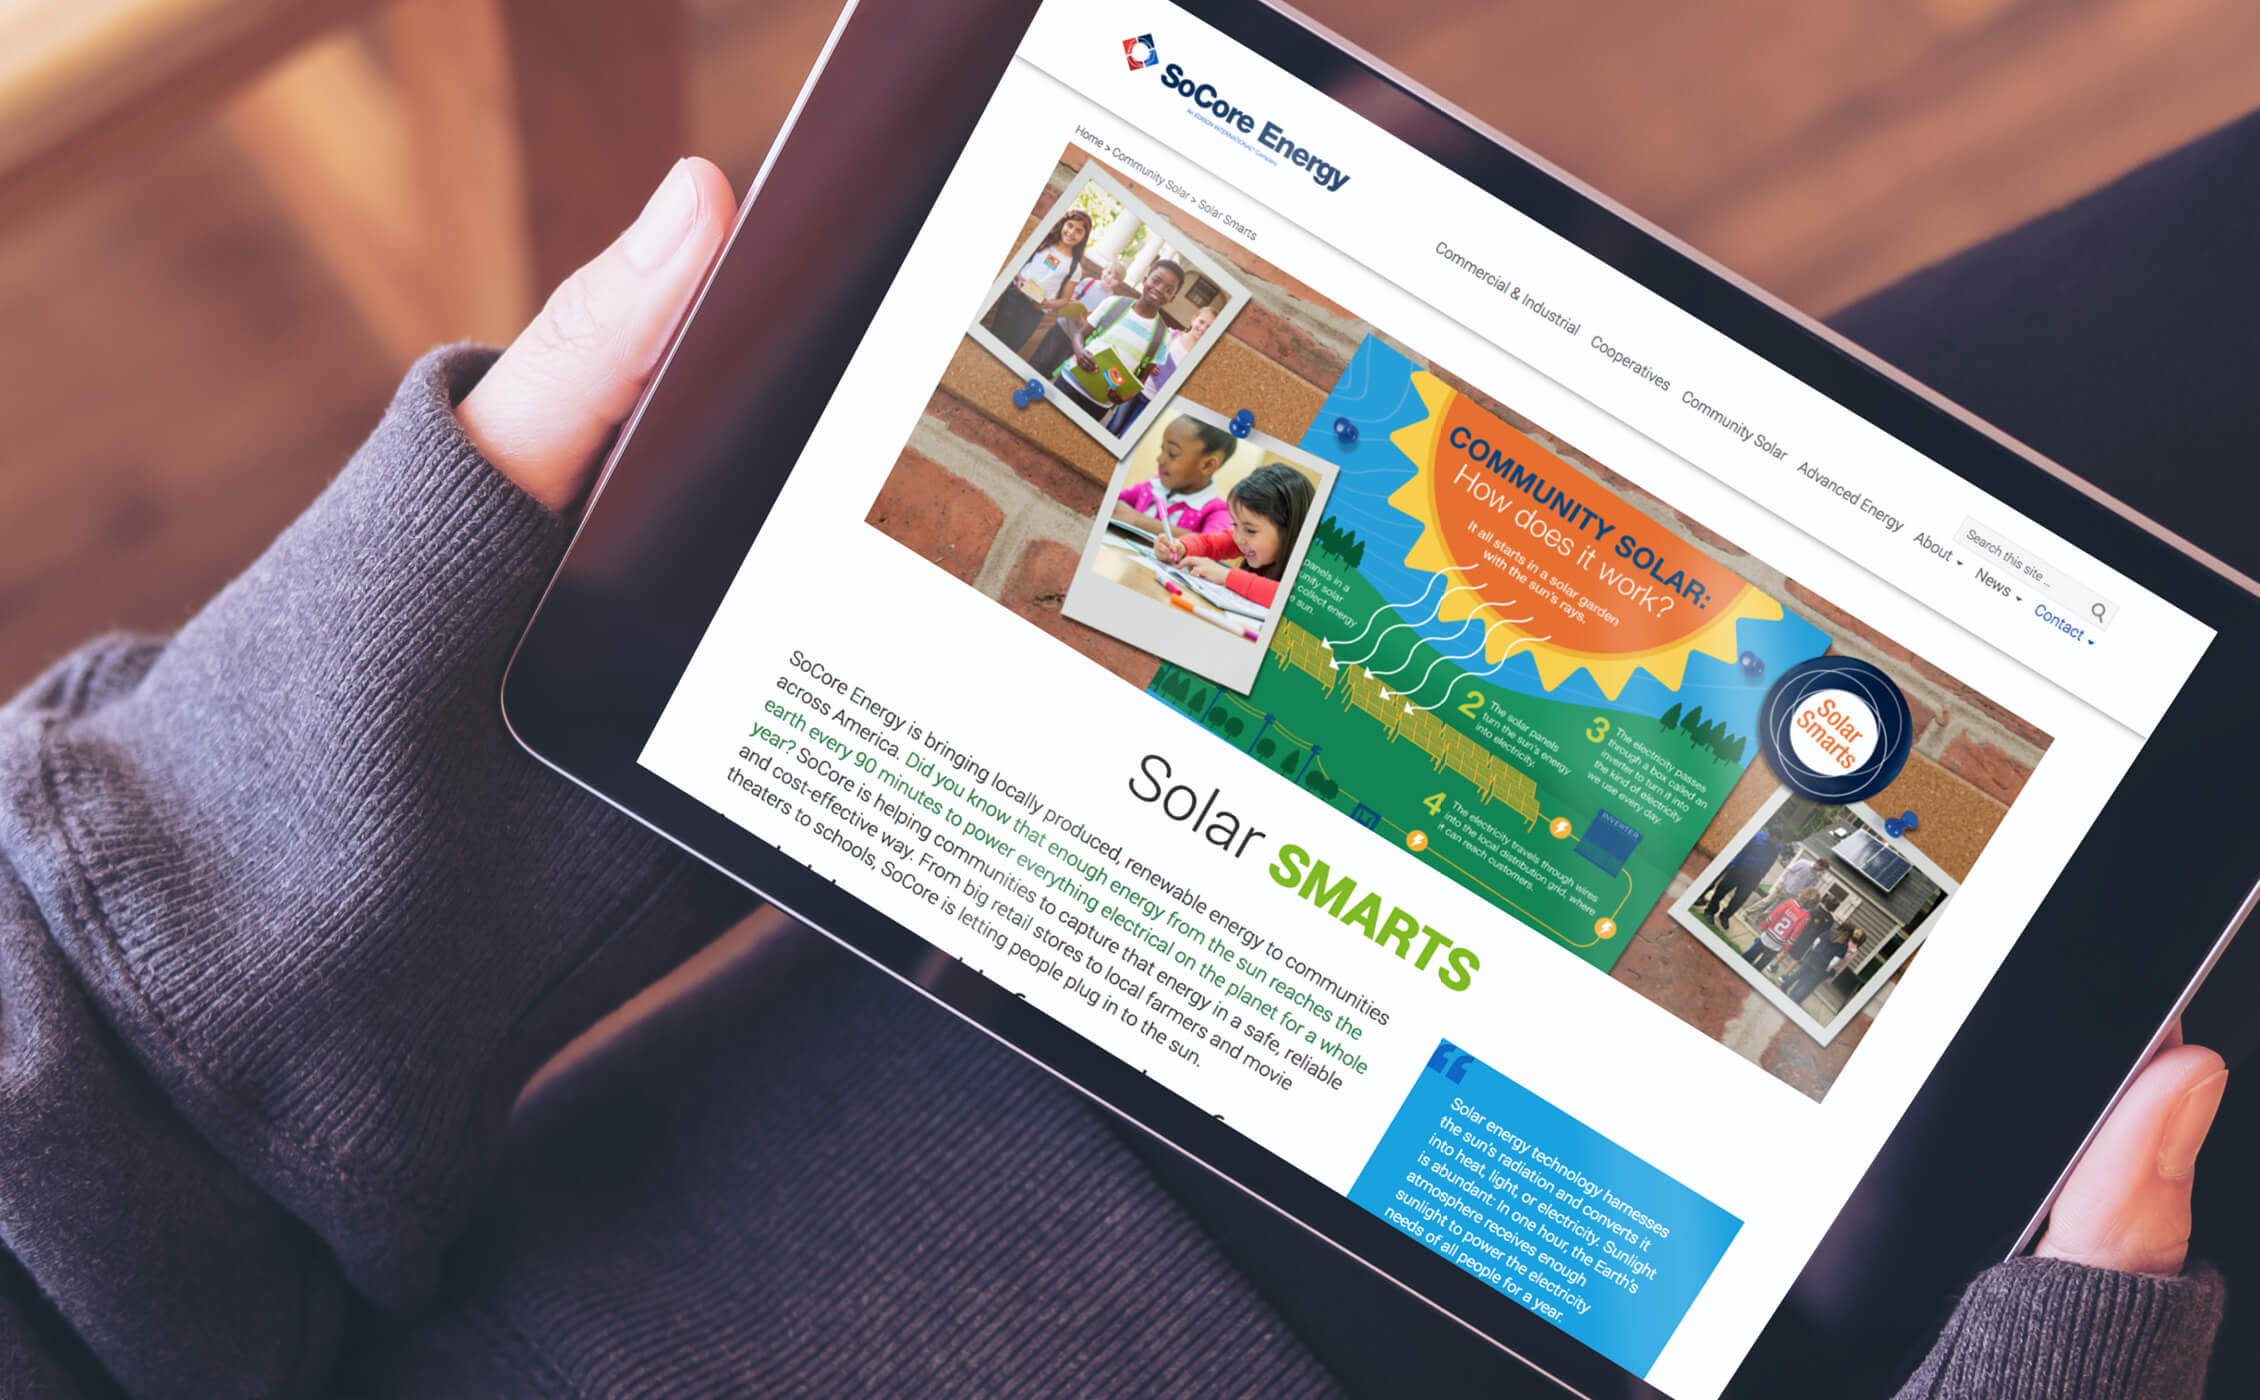 SoCore solar smarts web page image